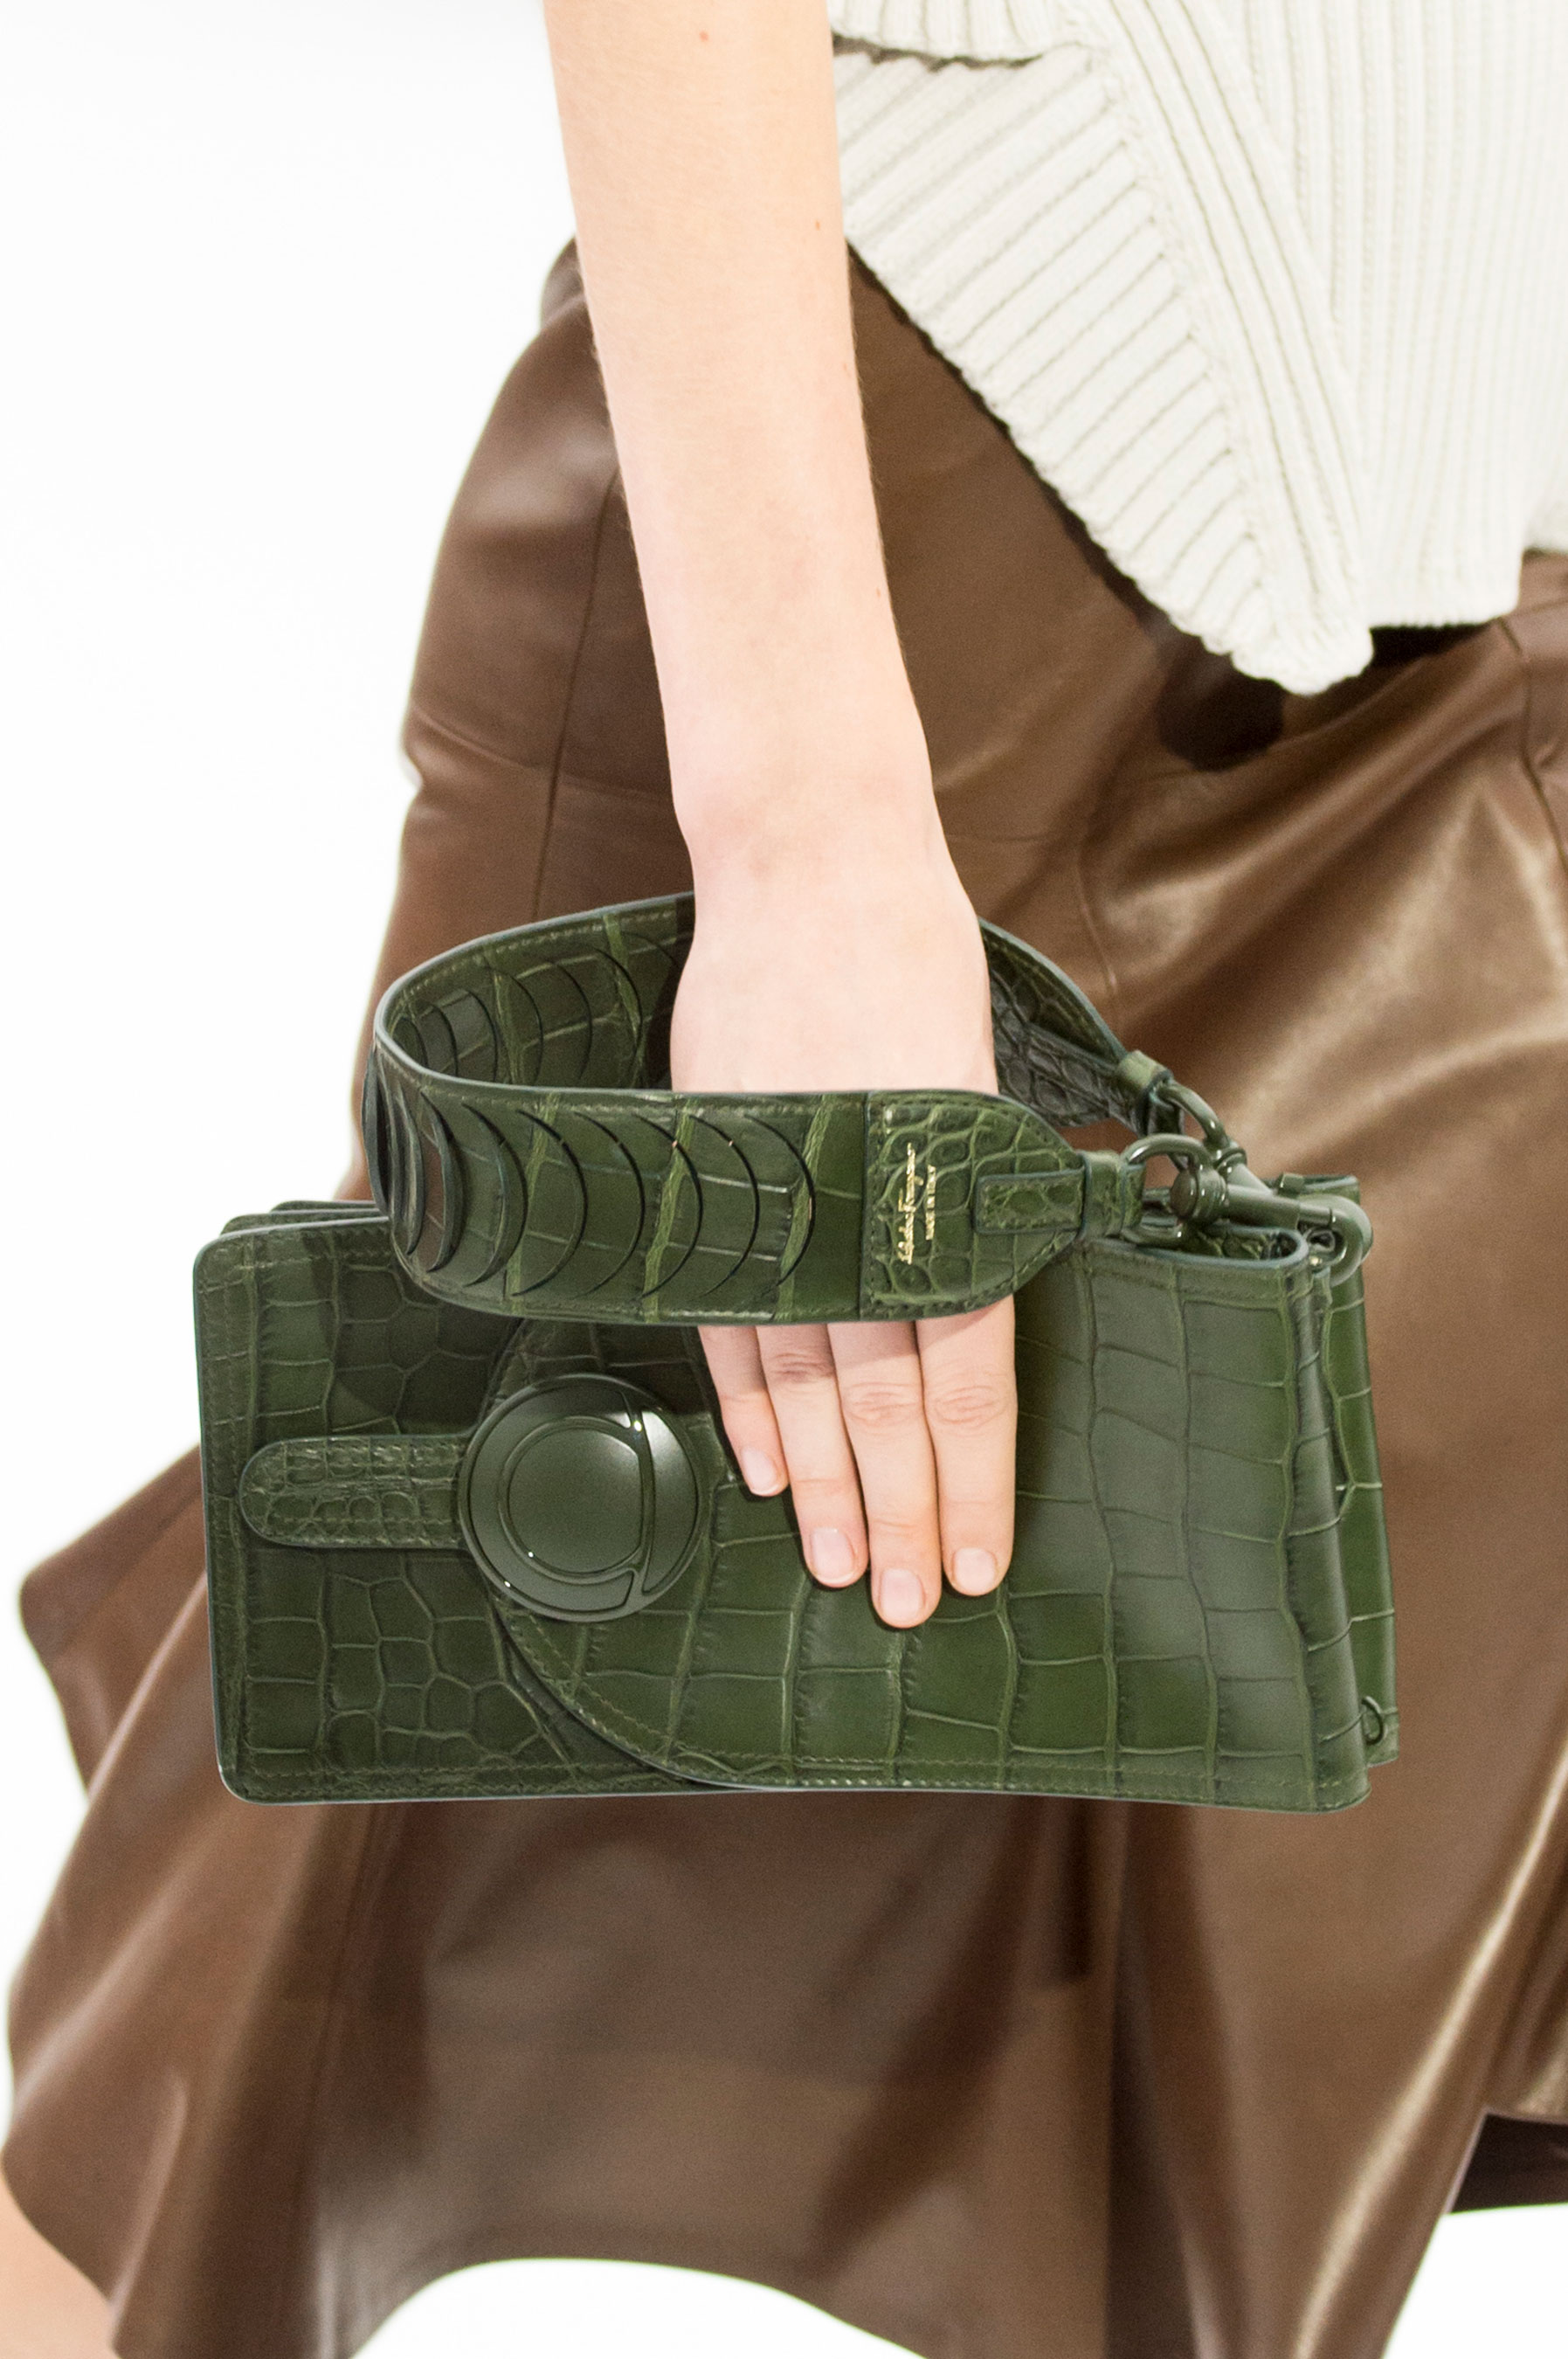 Salvatore Ferragamo presentó esta temporada un estilo clásico en tono verde. (The Fashion Group Foundation)